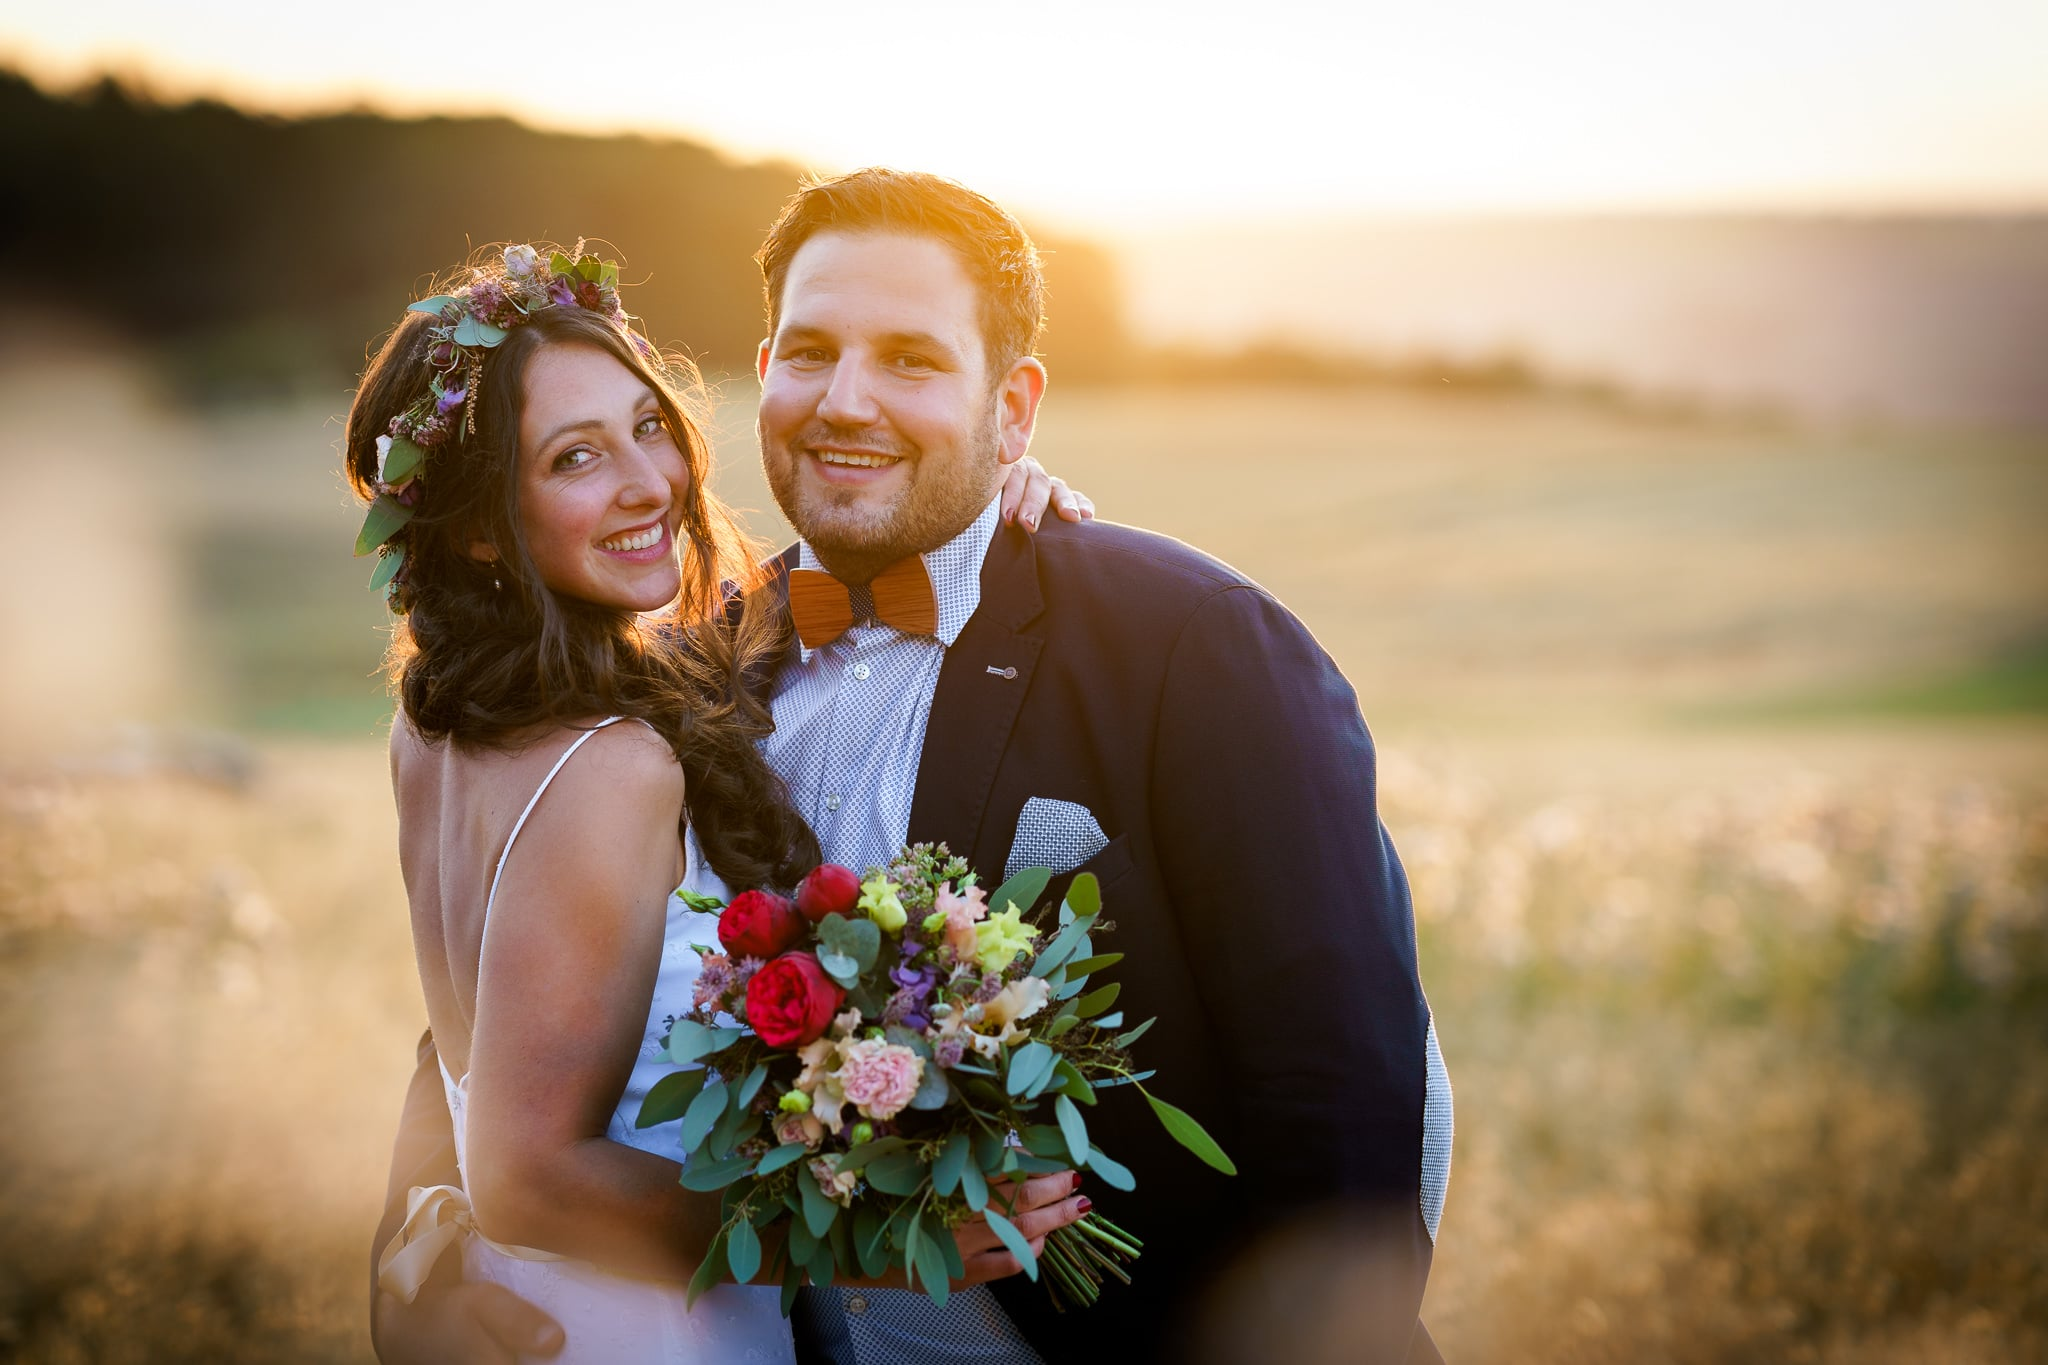 Brautpaar im Kornfeld bei Sonnenuntergang in Osburg Region Trier